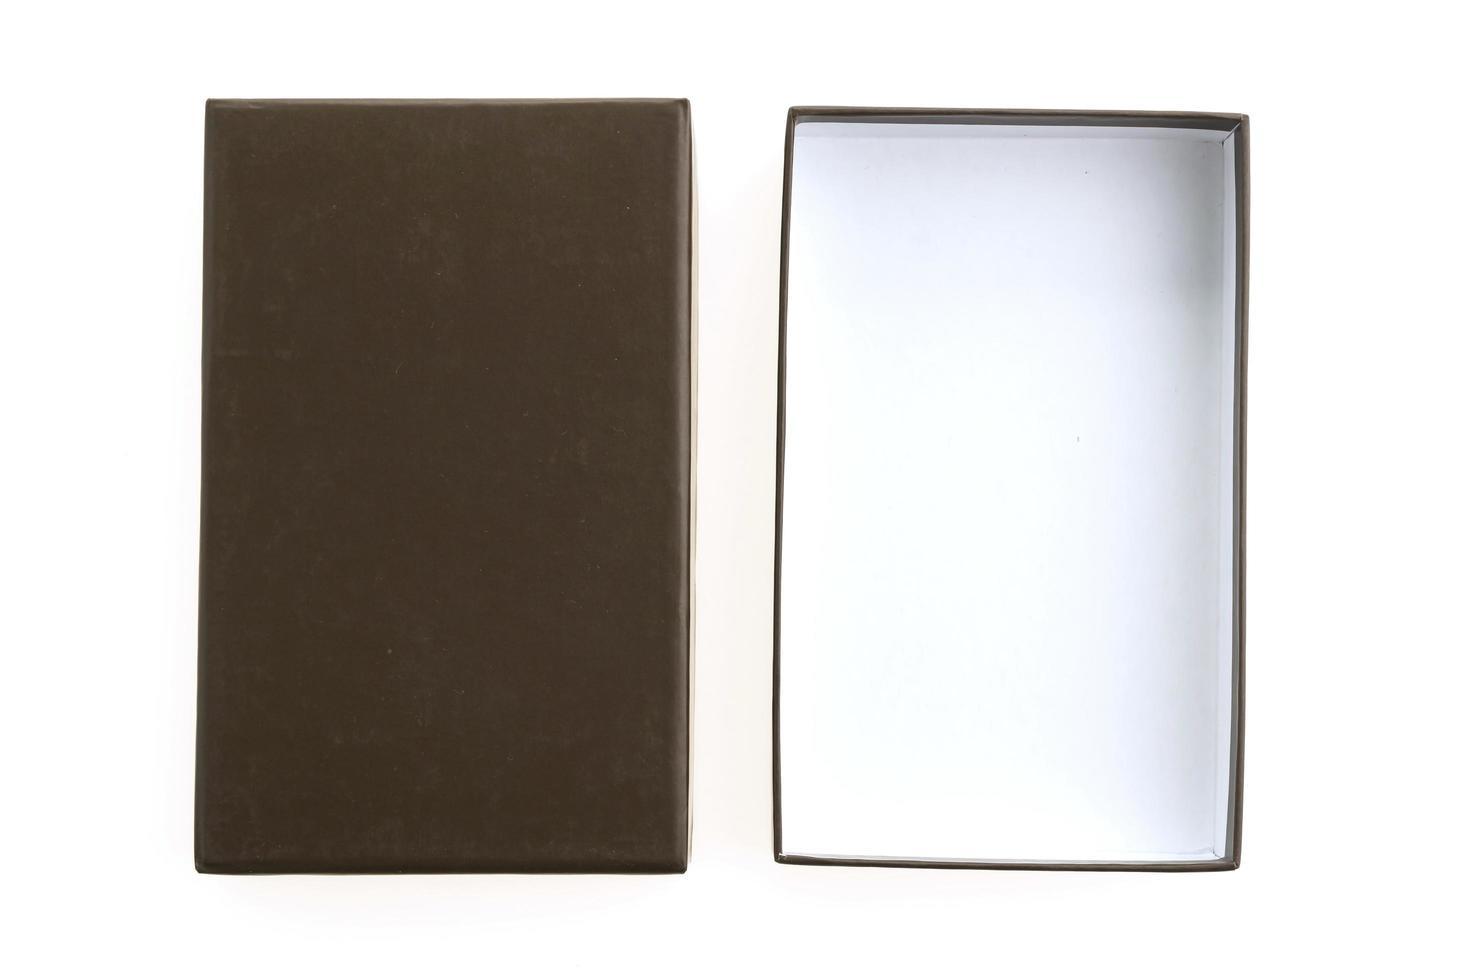 svart låda på vit bakgrund foto